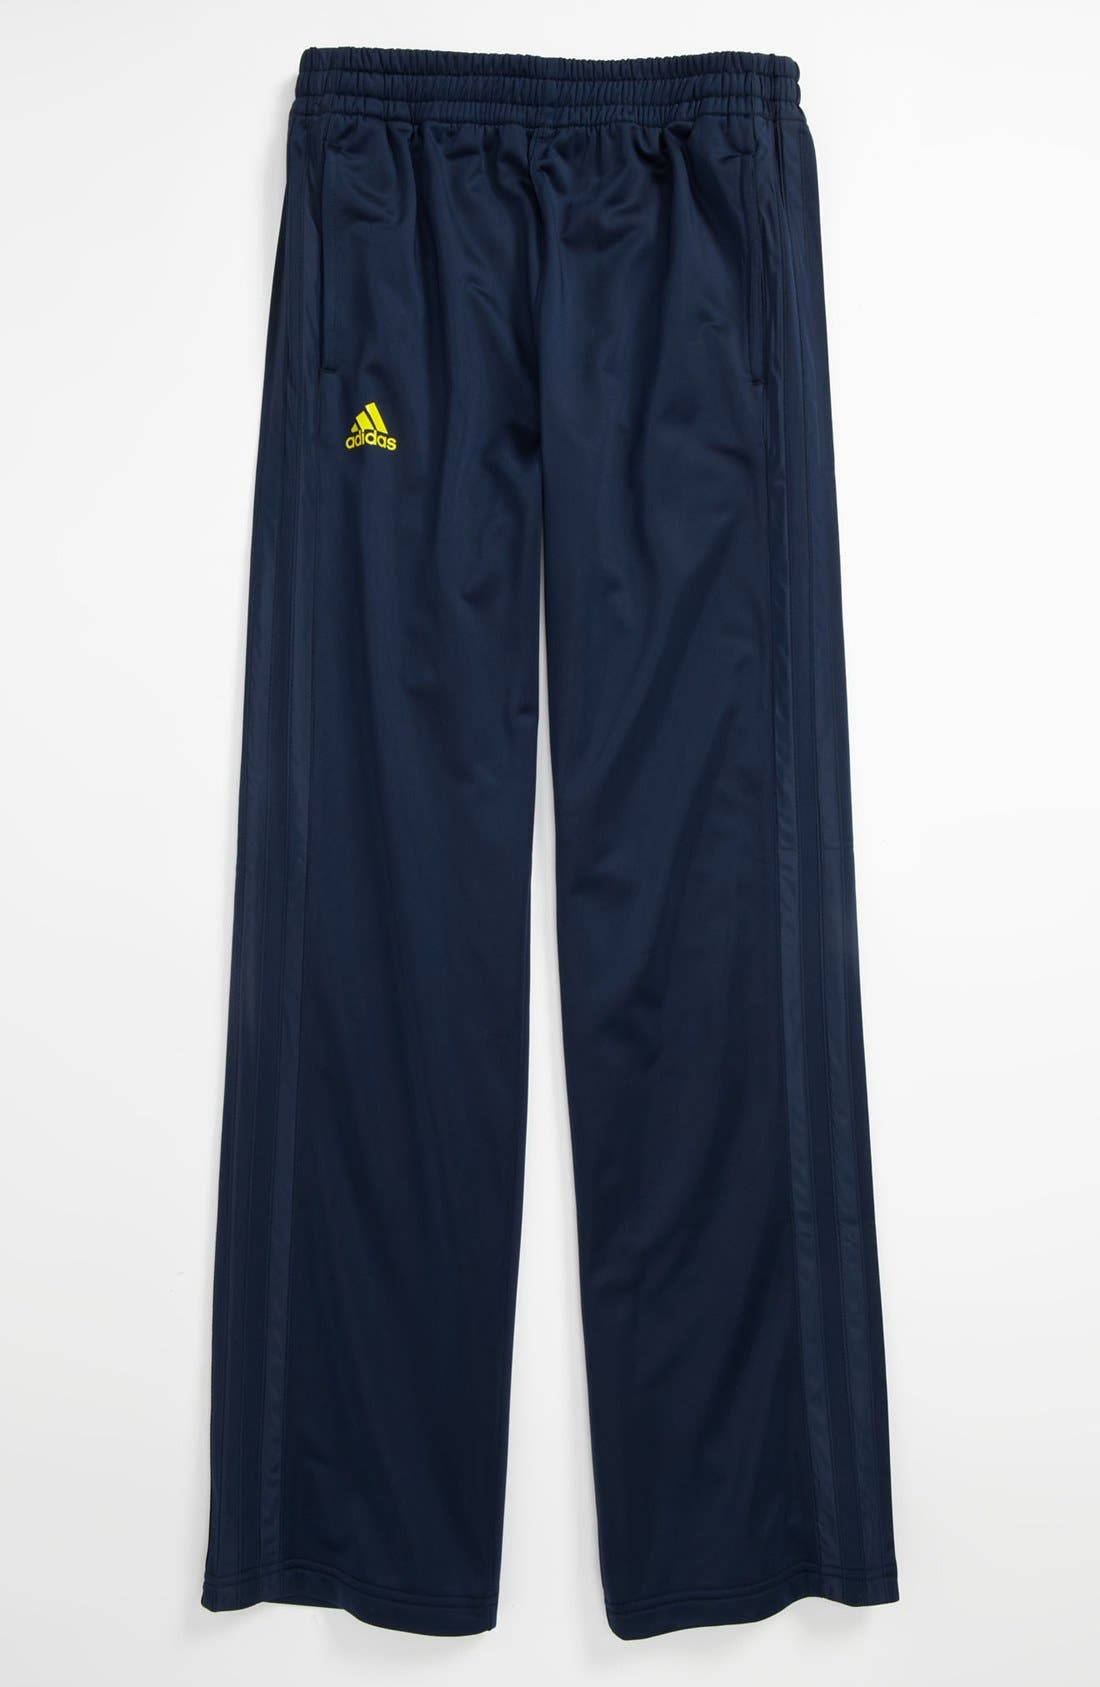 Main Image - adidas 'Fat Stripes' Basketball Pants (Big Boys)